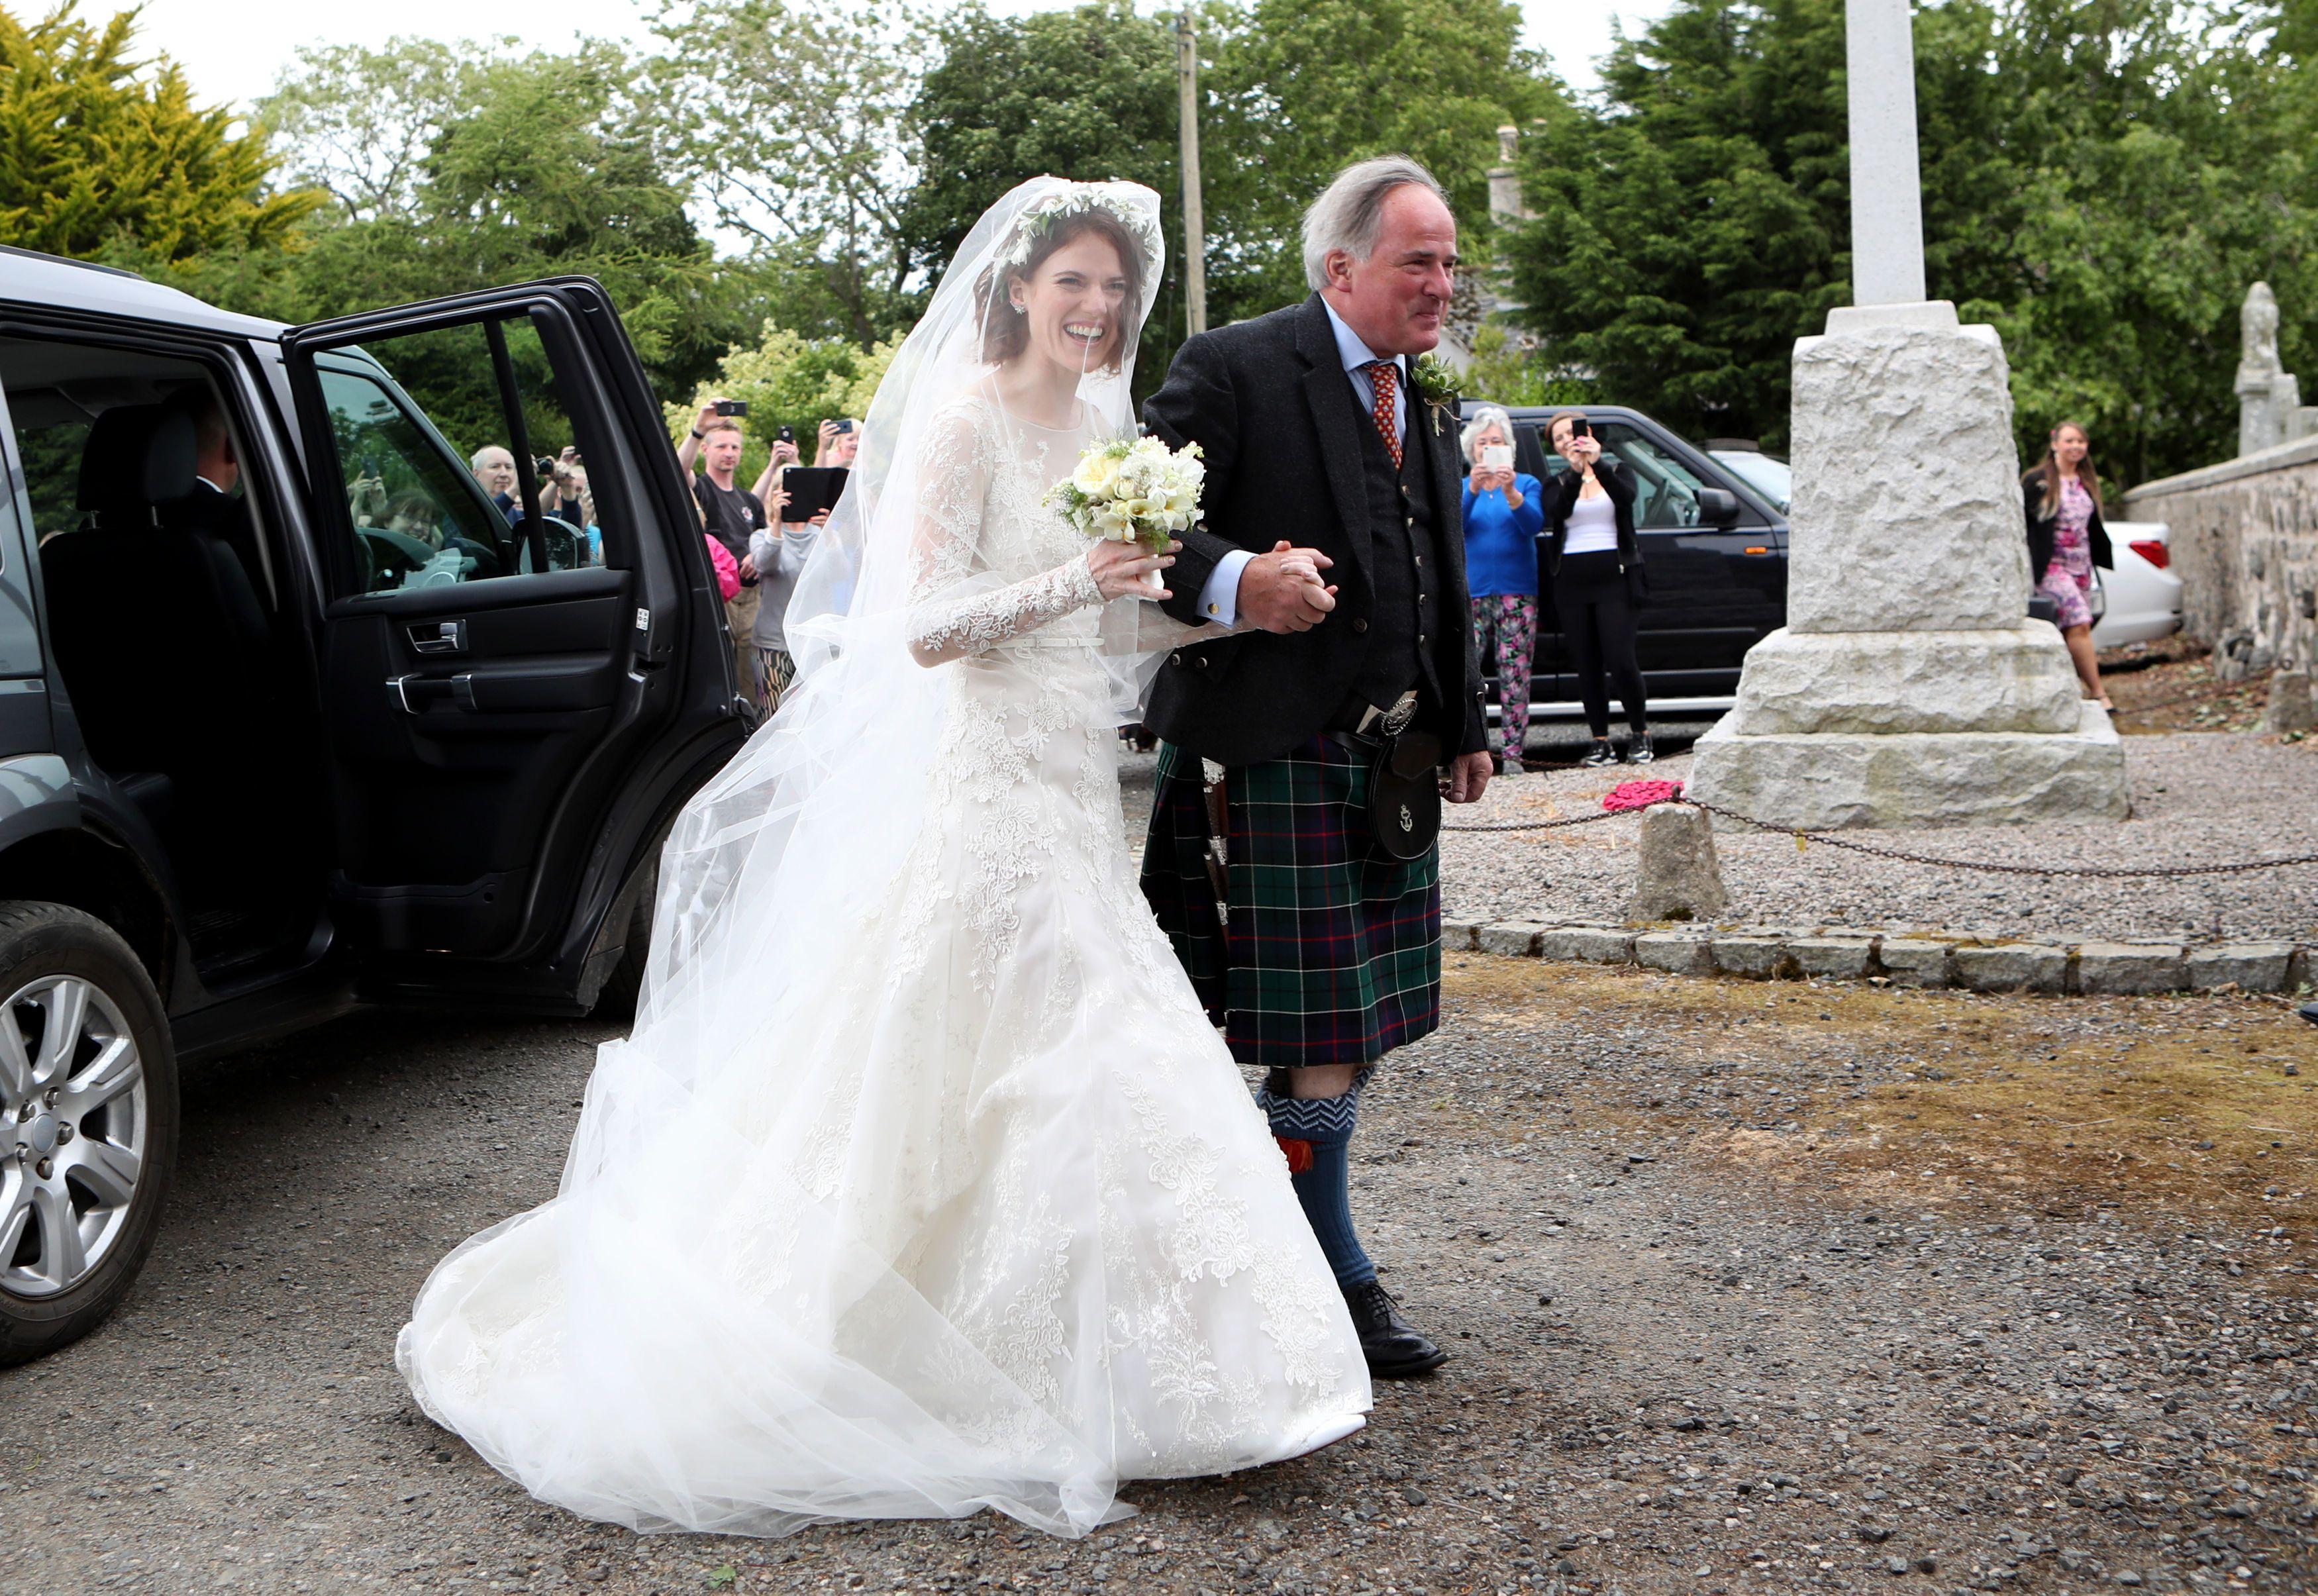 Marisha Ray Wedding.Rose Leslie Kit Harington Wedding Aidainternational Nl